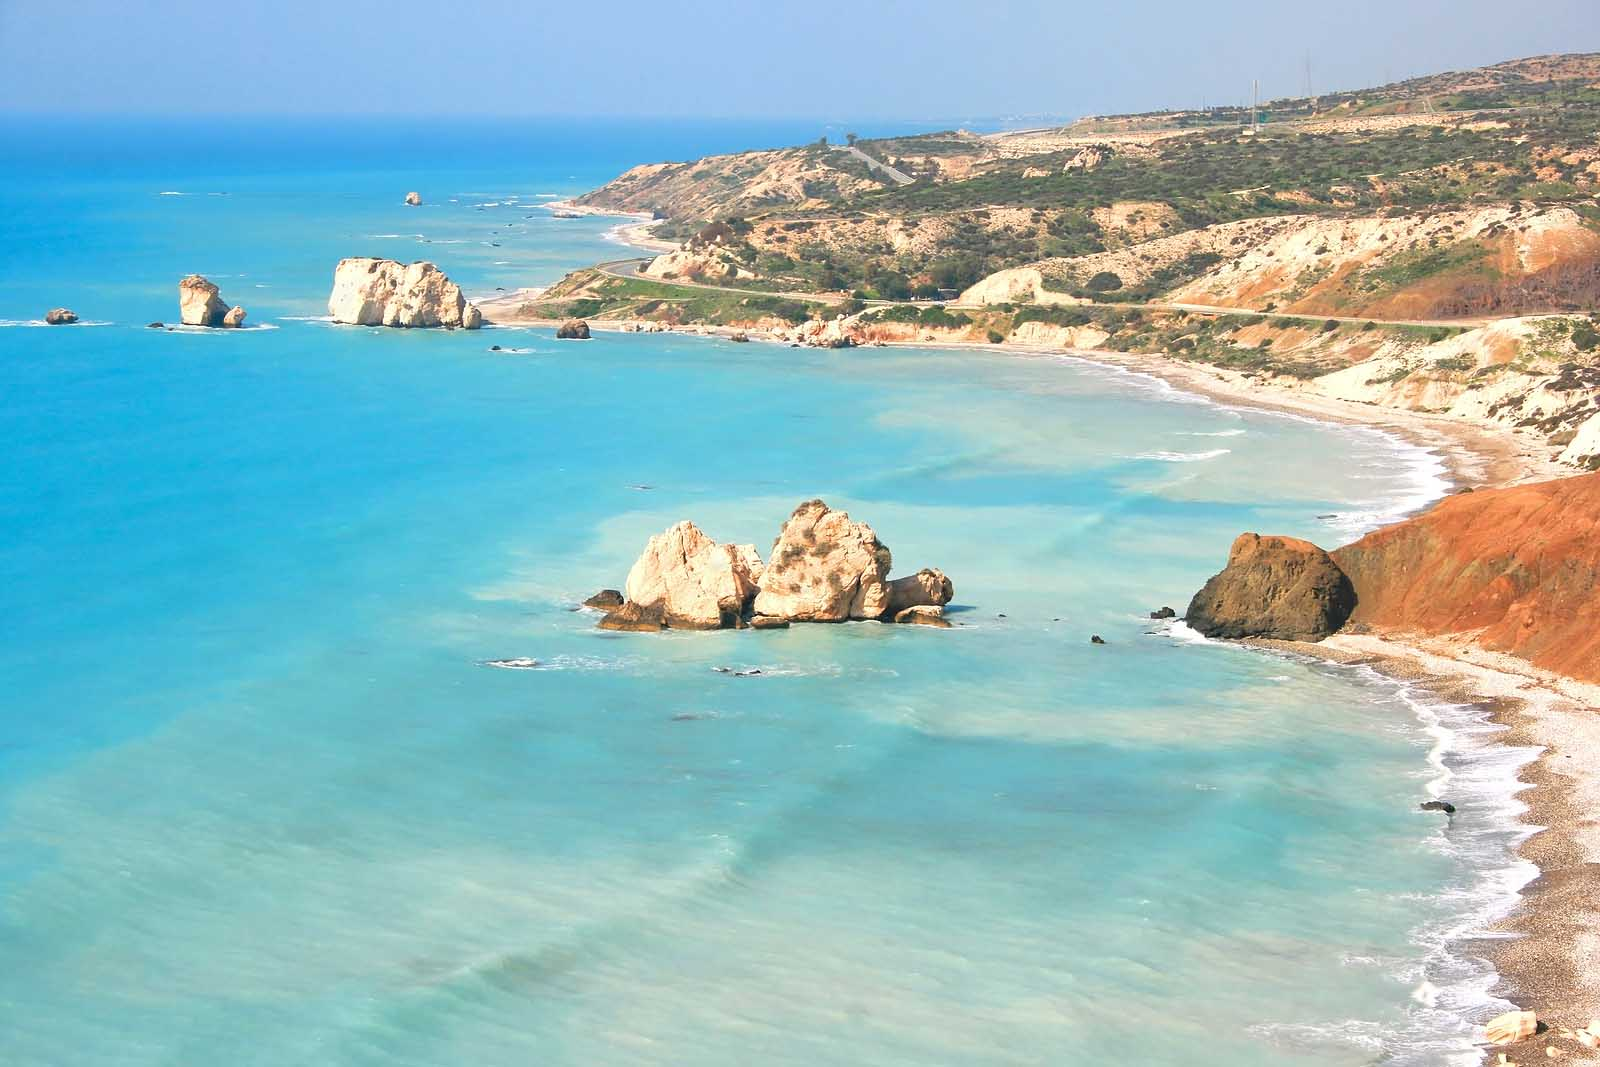 Zboruri ieftine in plin sezon Paphos, Cipru – de la 58 EUR dus-intors